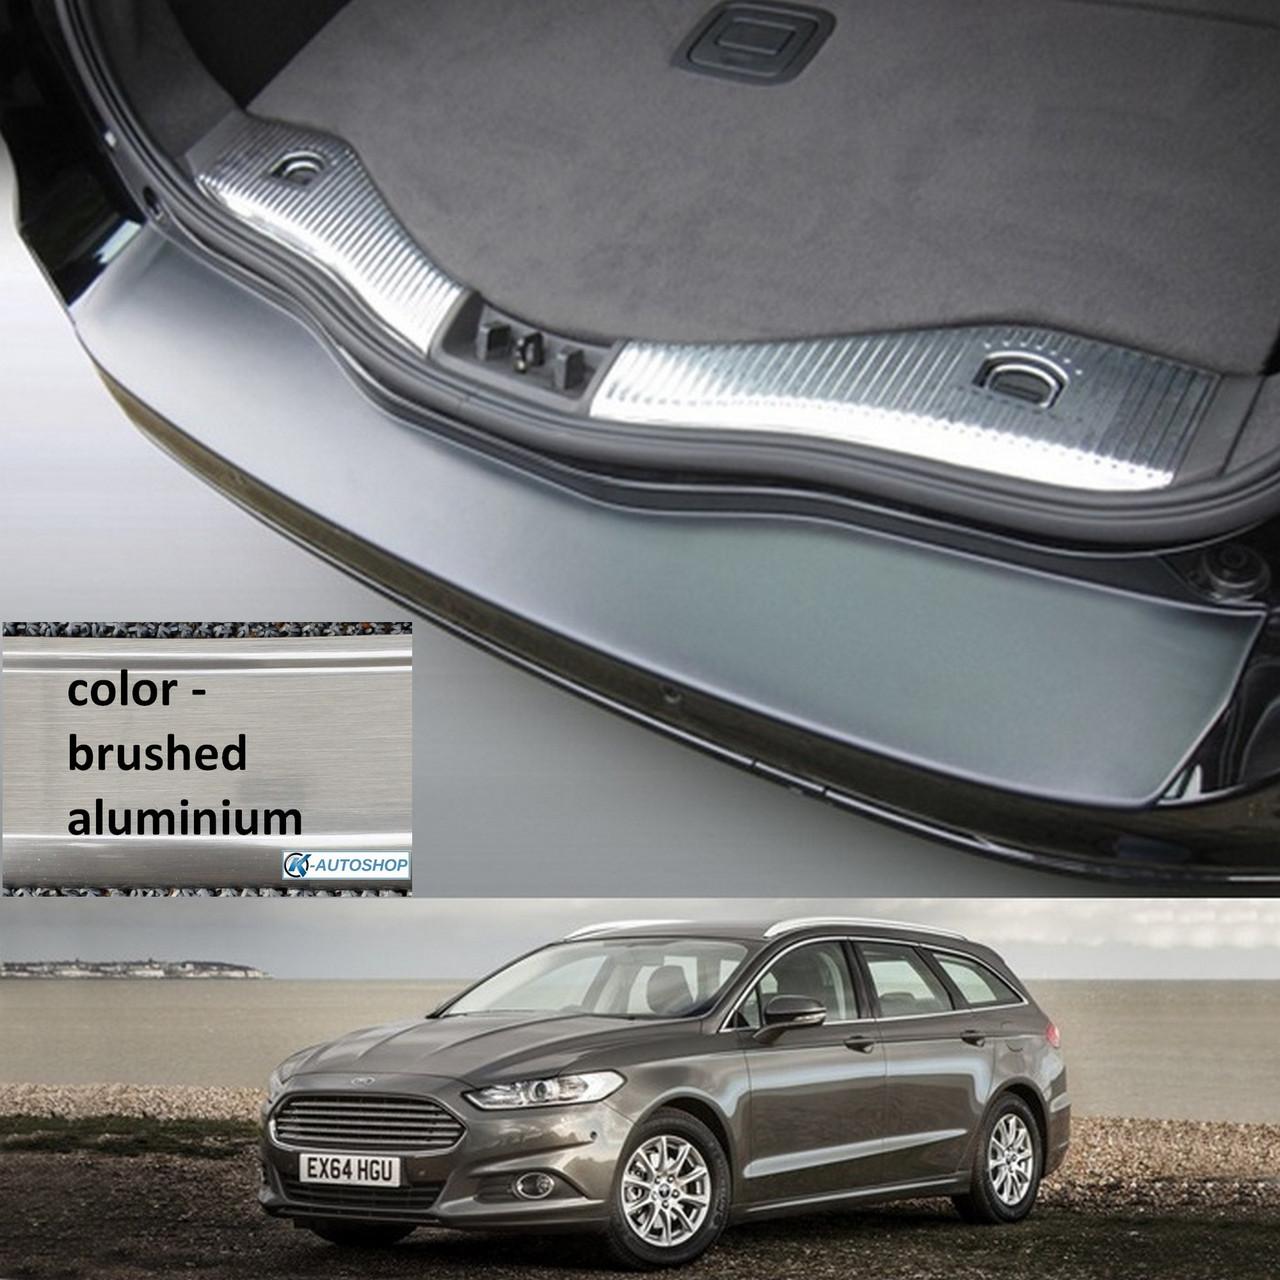 Пластикова захисна накладка на задній бампер для Ford Mondeo Mk5 Turnier 2014>